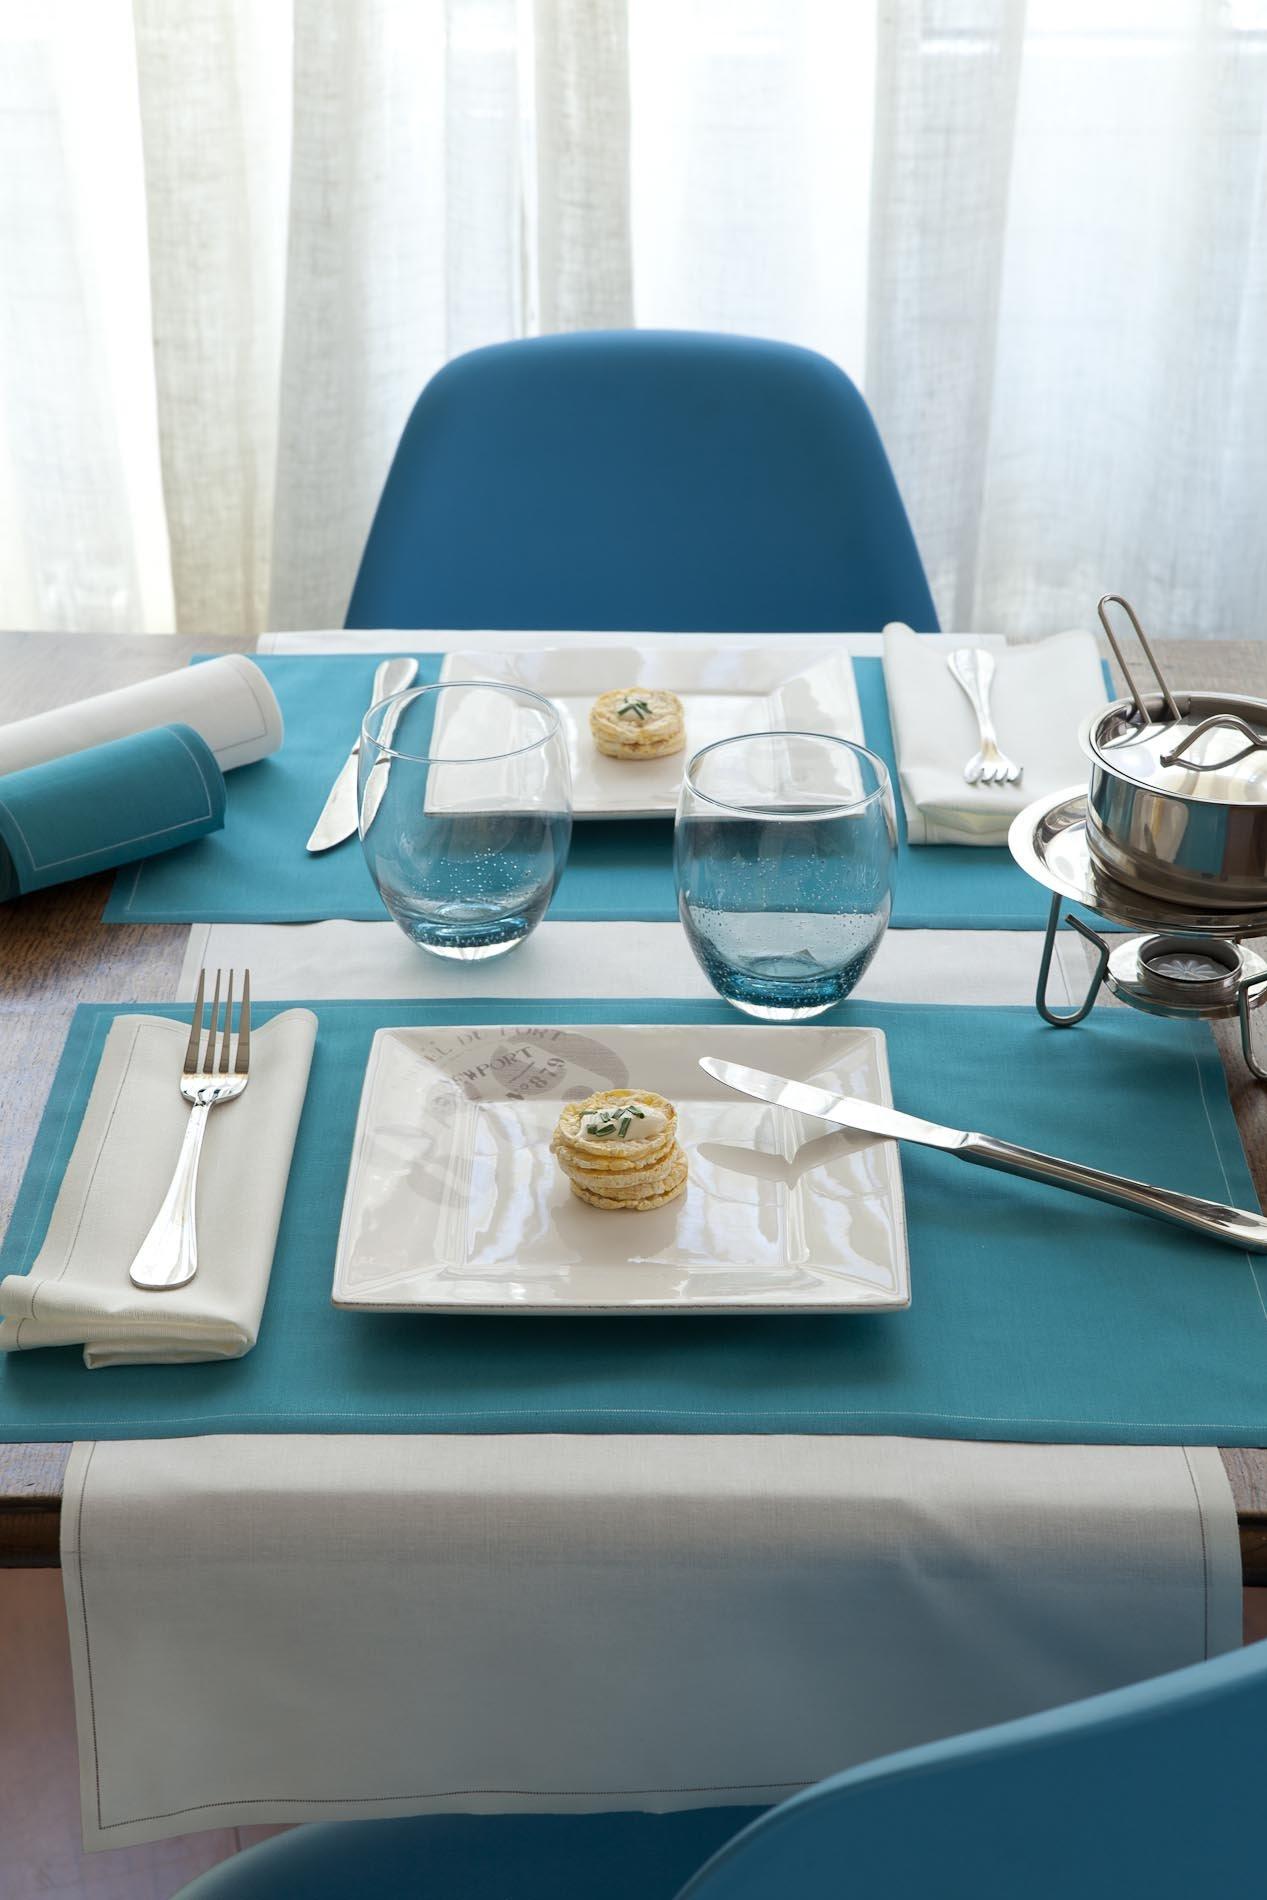 Cotton Dinner Napkin - 12.6 x 12.6 in - 12 units per roll - Ecru by MYdrap (Image #4)